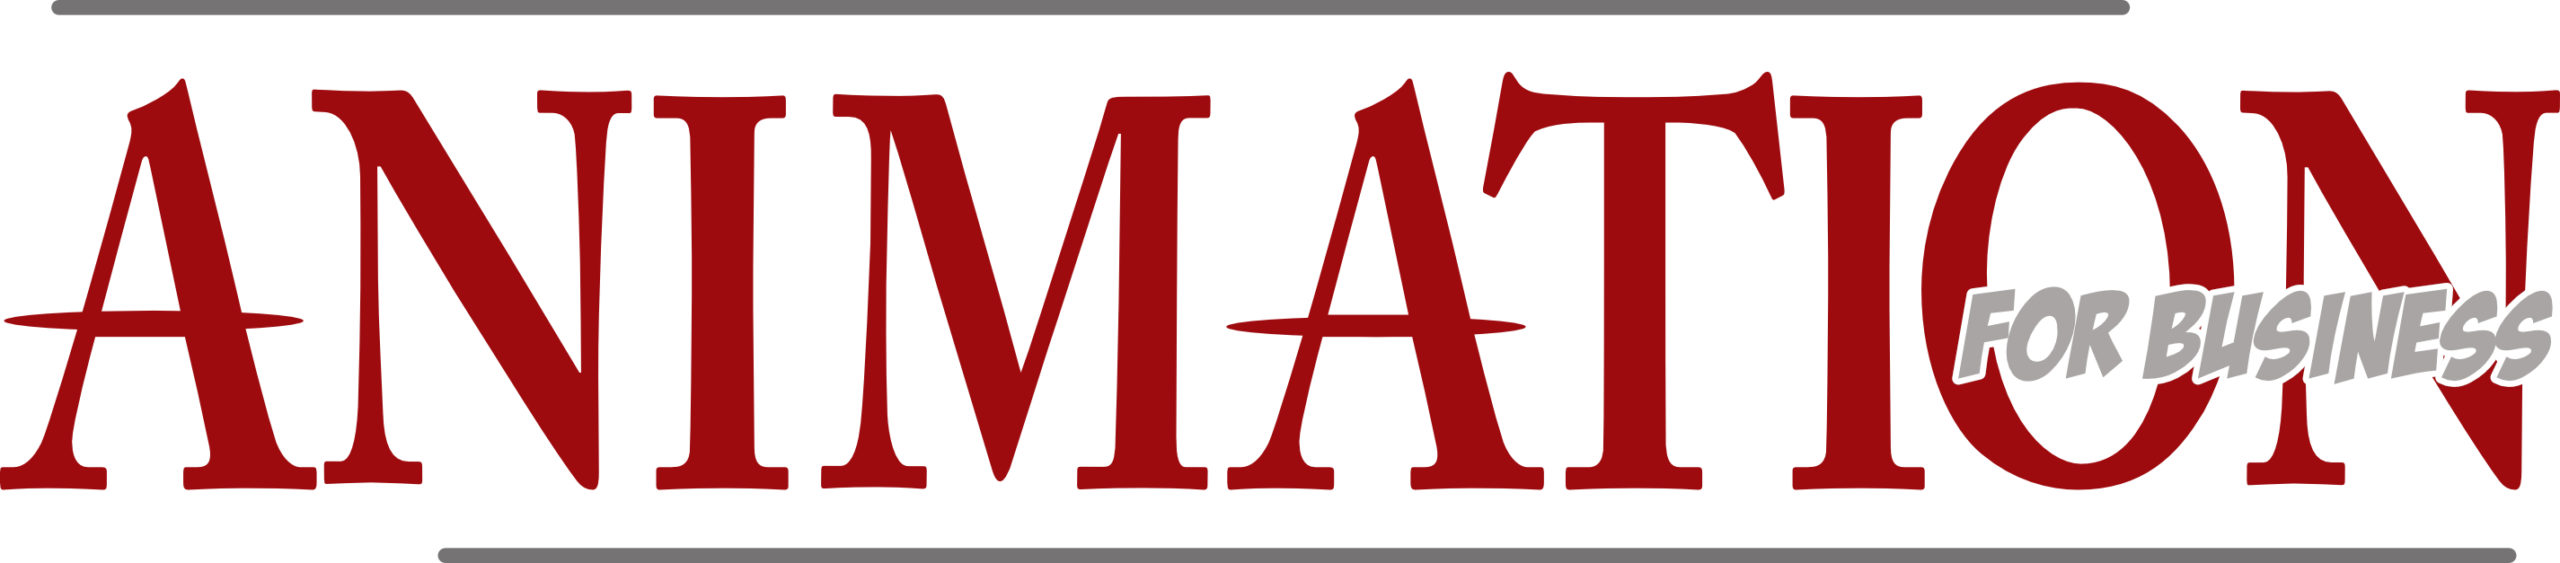 Mastin Creative - Animation for Business